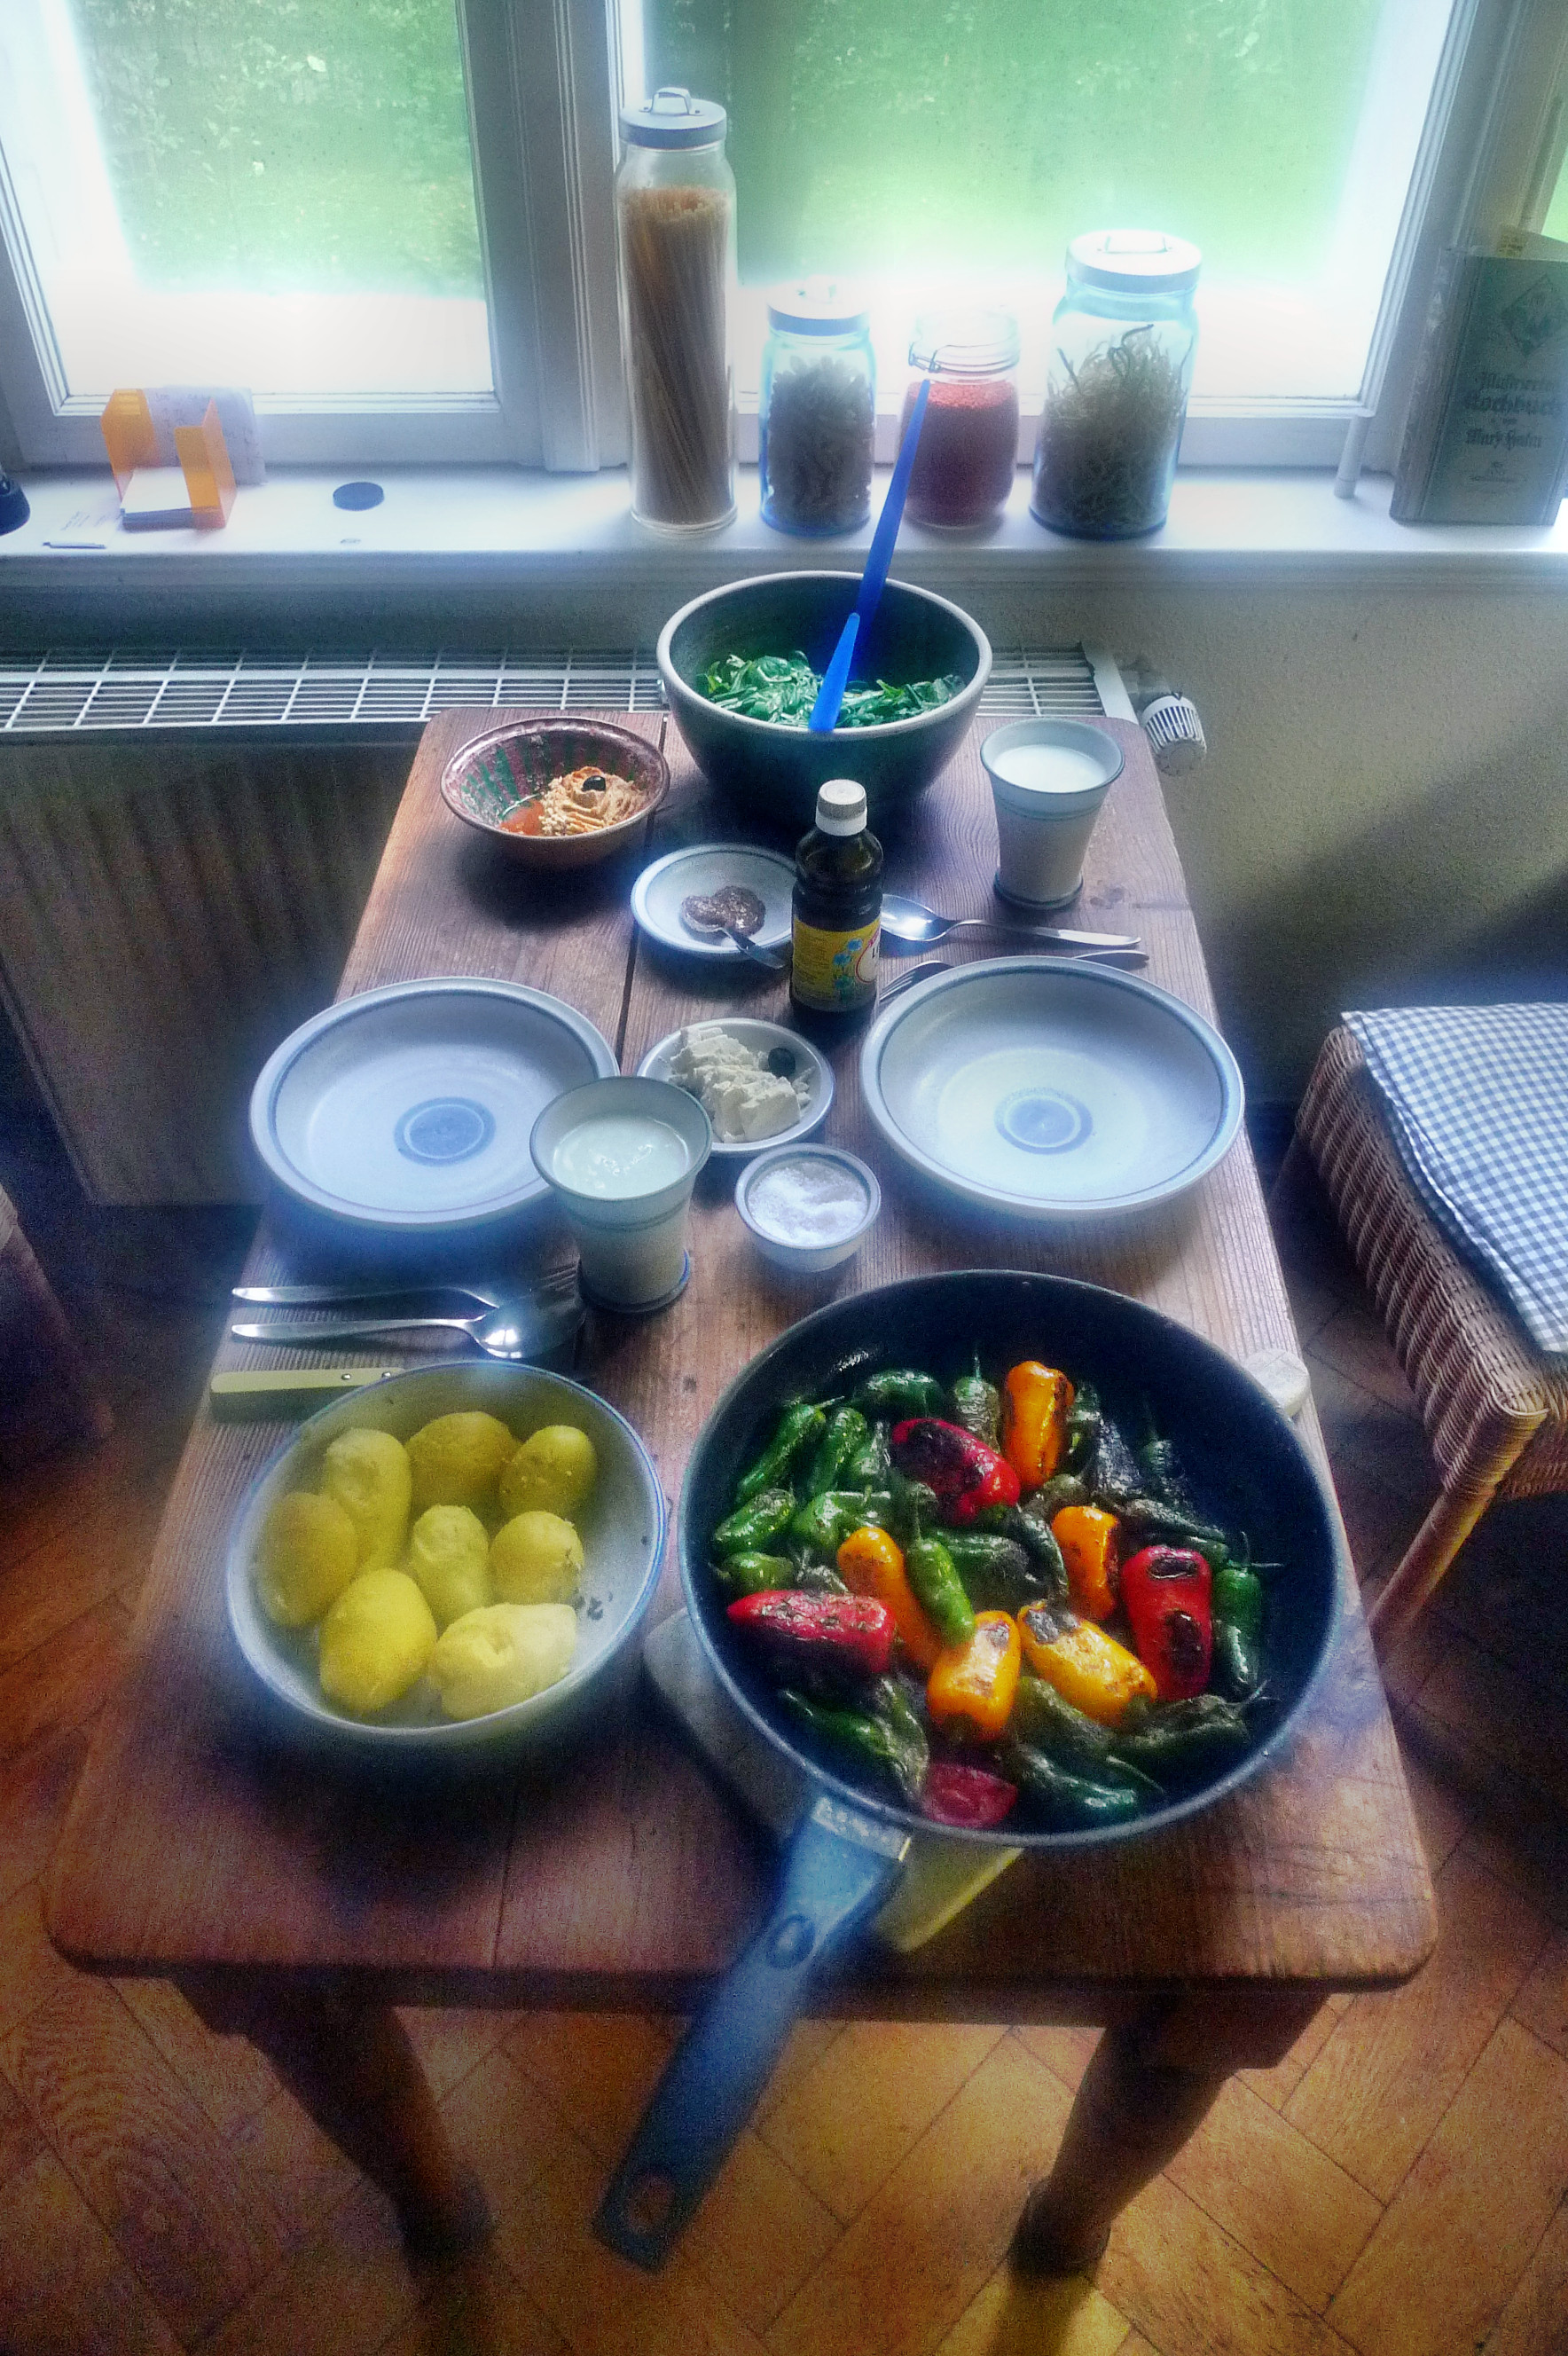 Pimentos-Paprika-Kartoffel-Salat-Buttermilch- 28.9.14   (9)